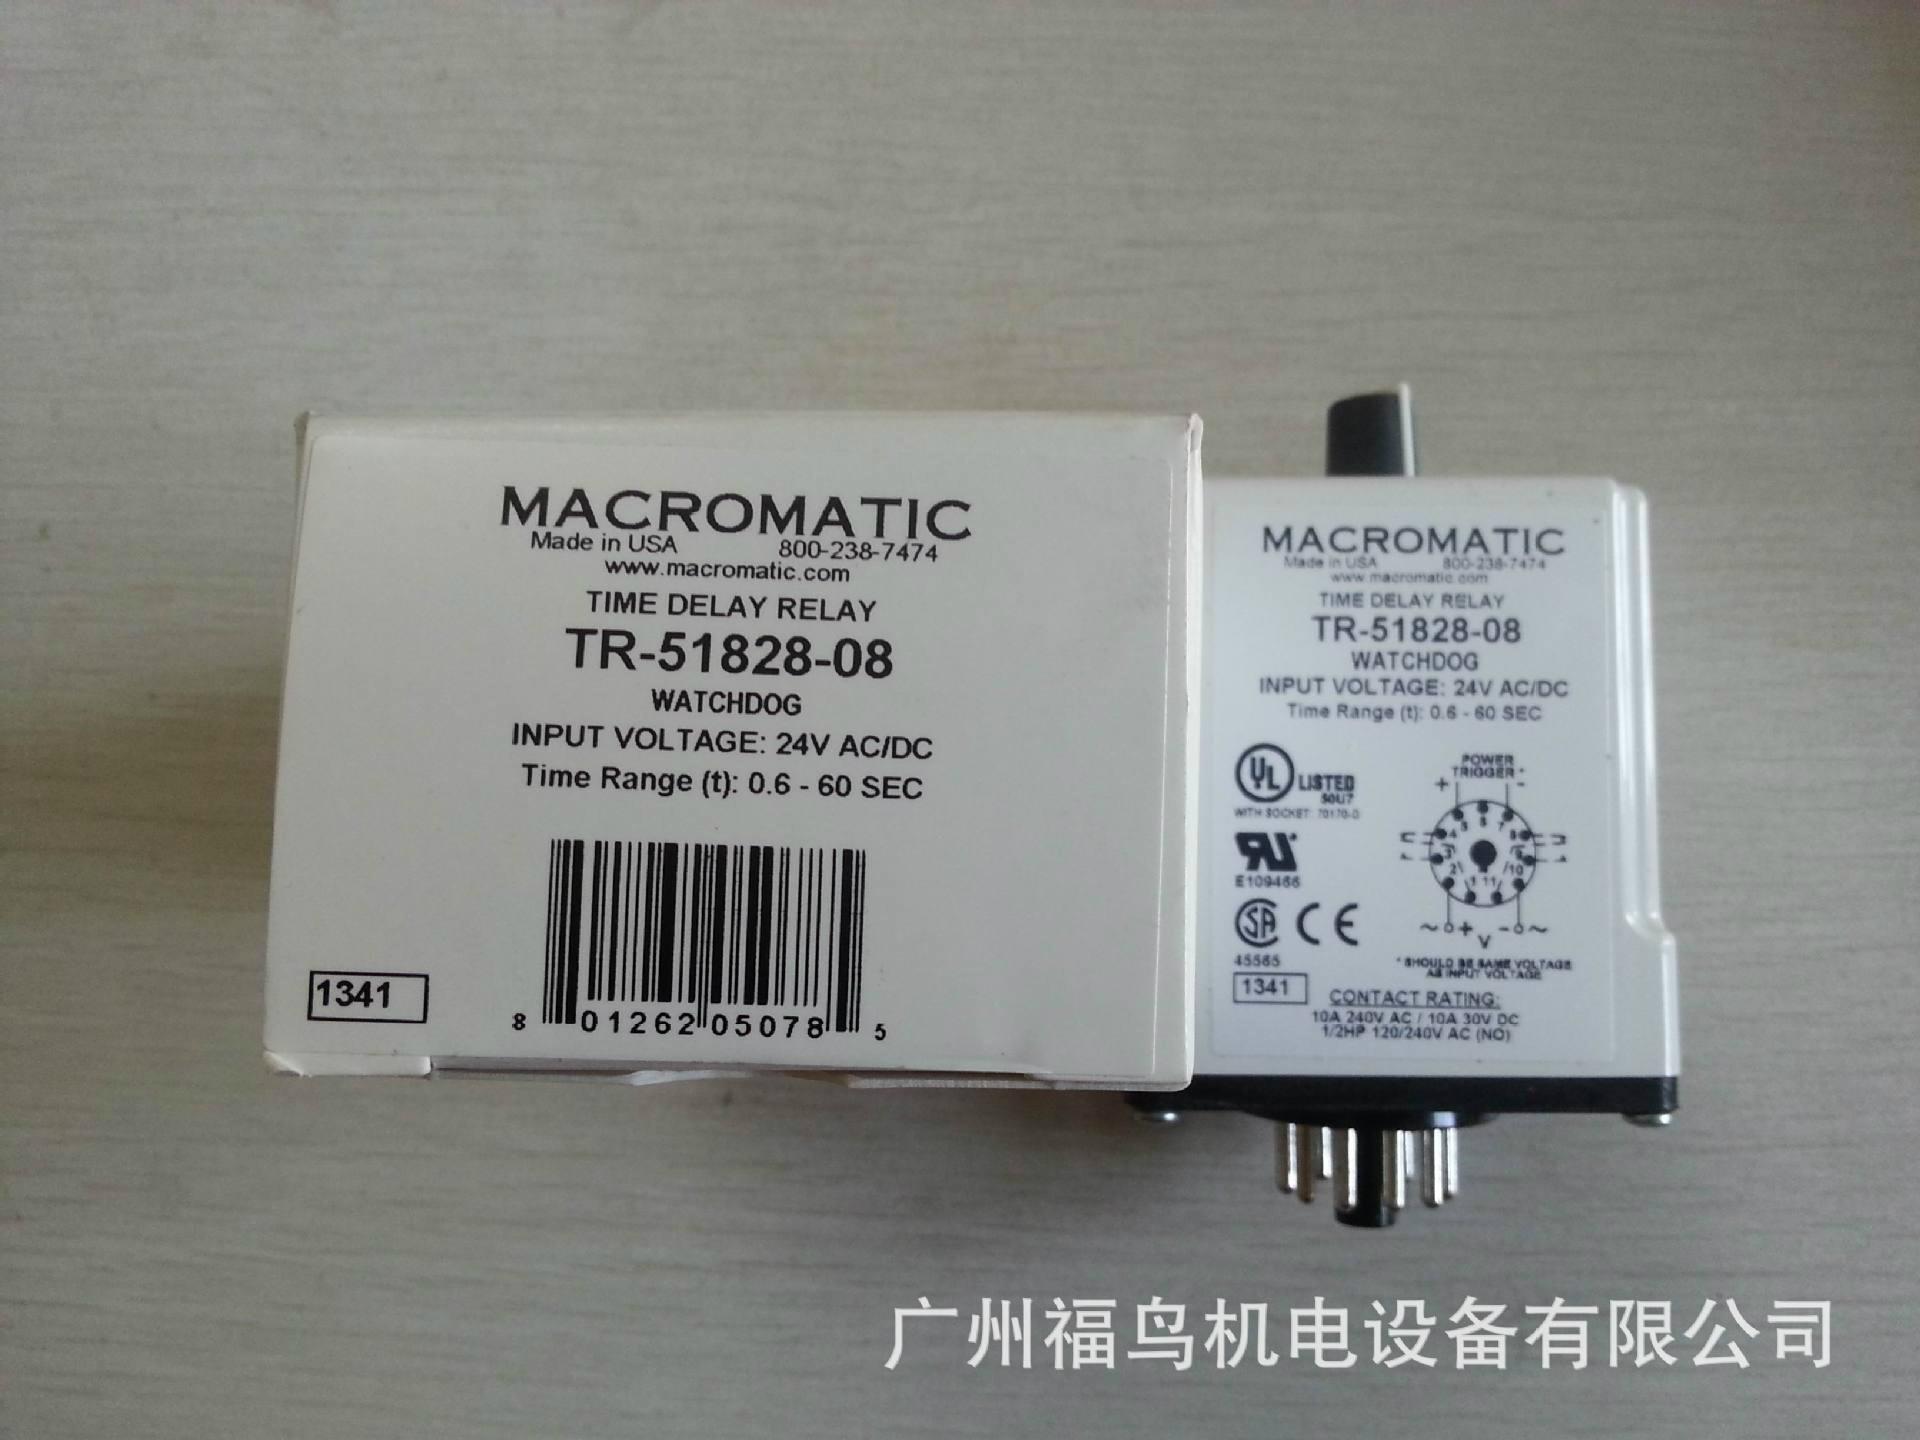 MACROMATIC延時繼電器, 型號:TR-51828-08